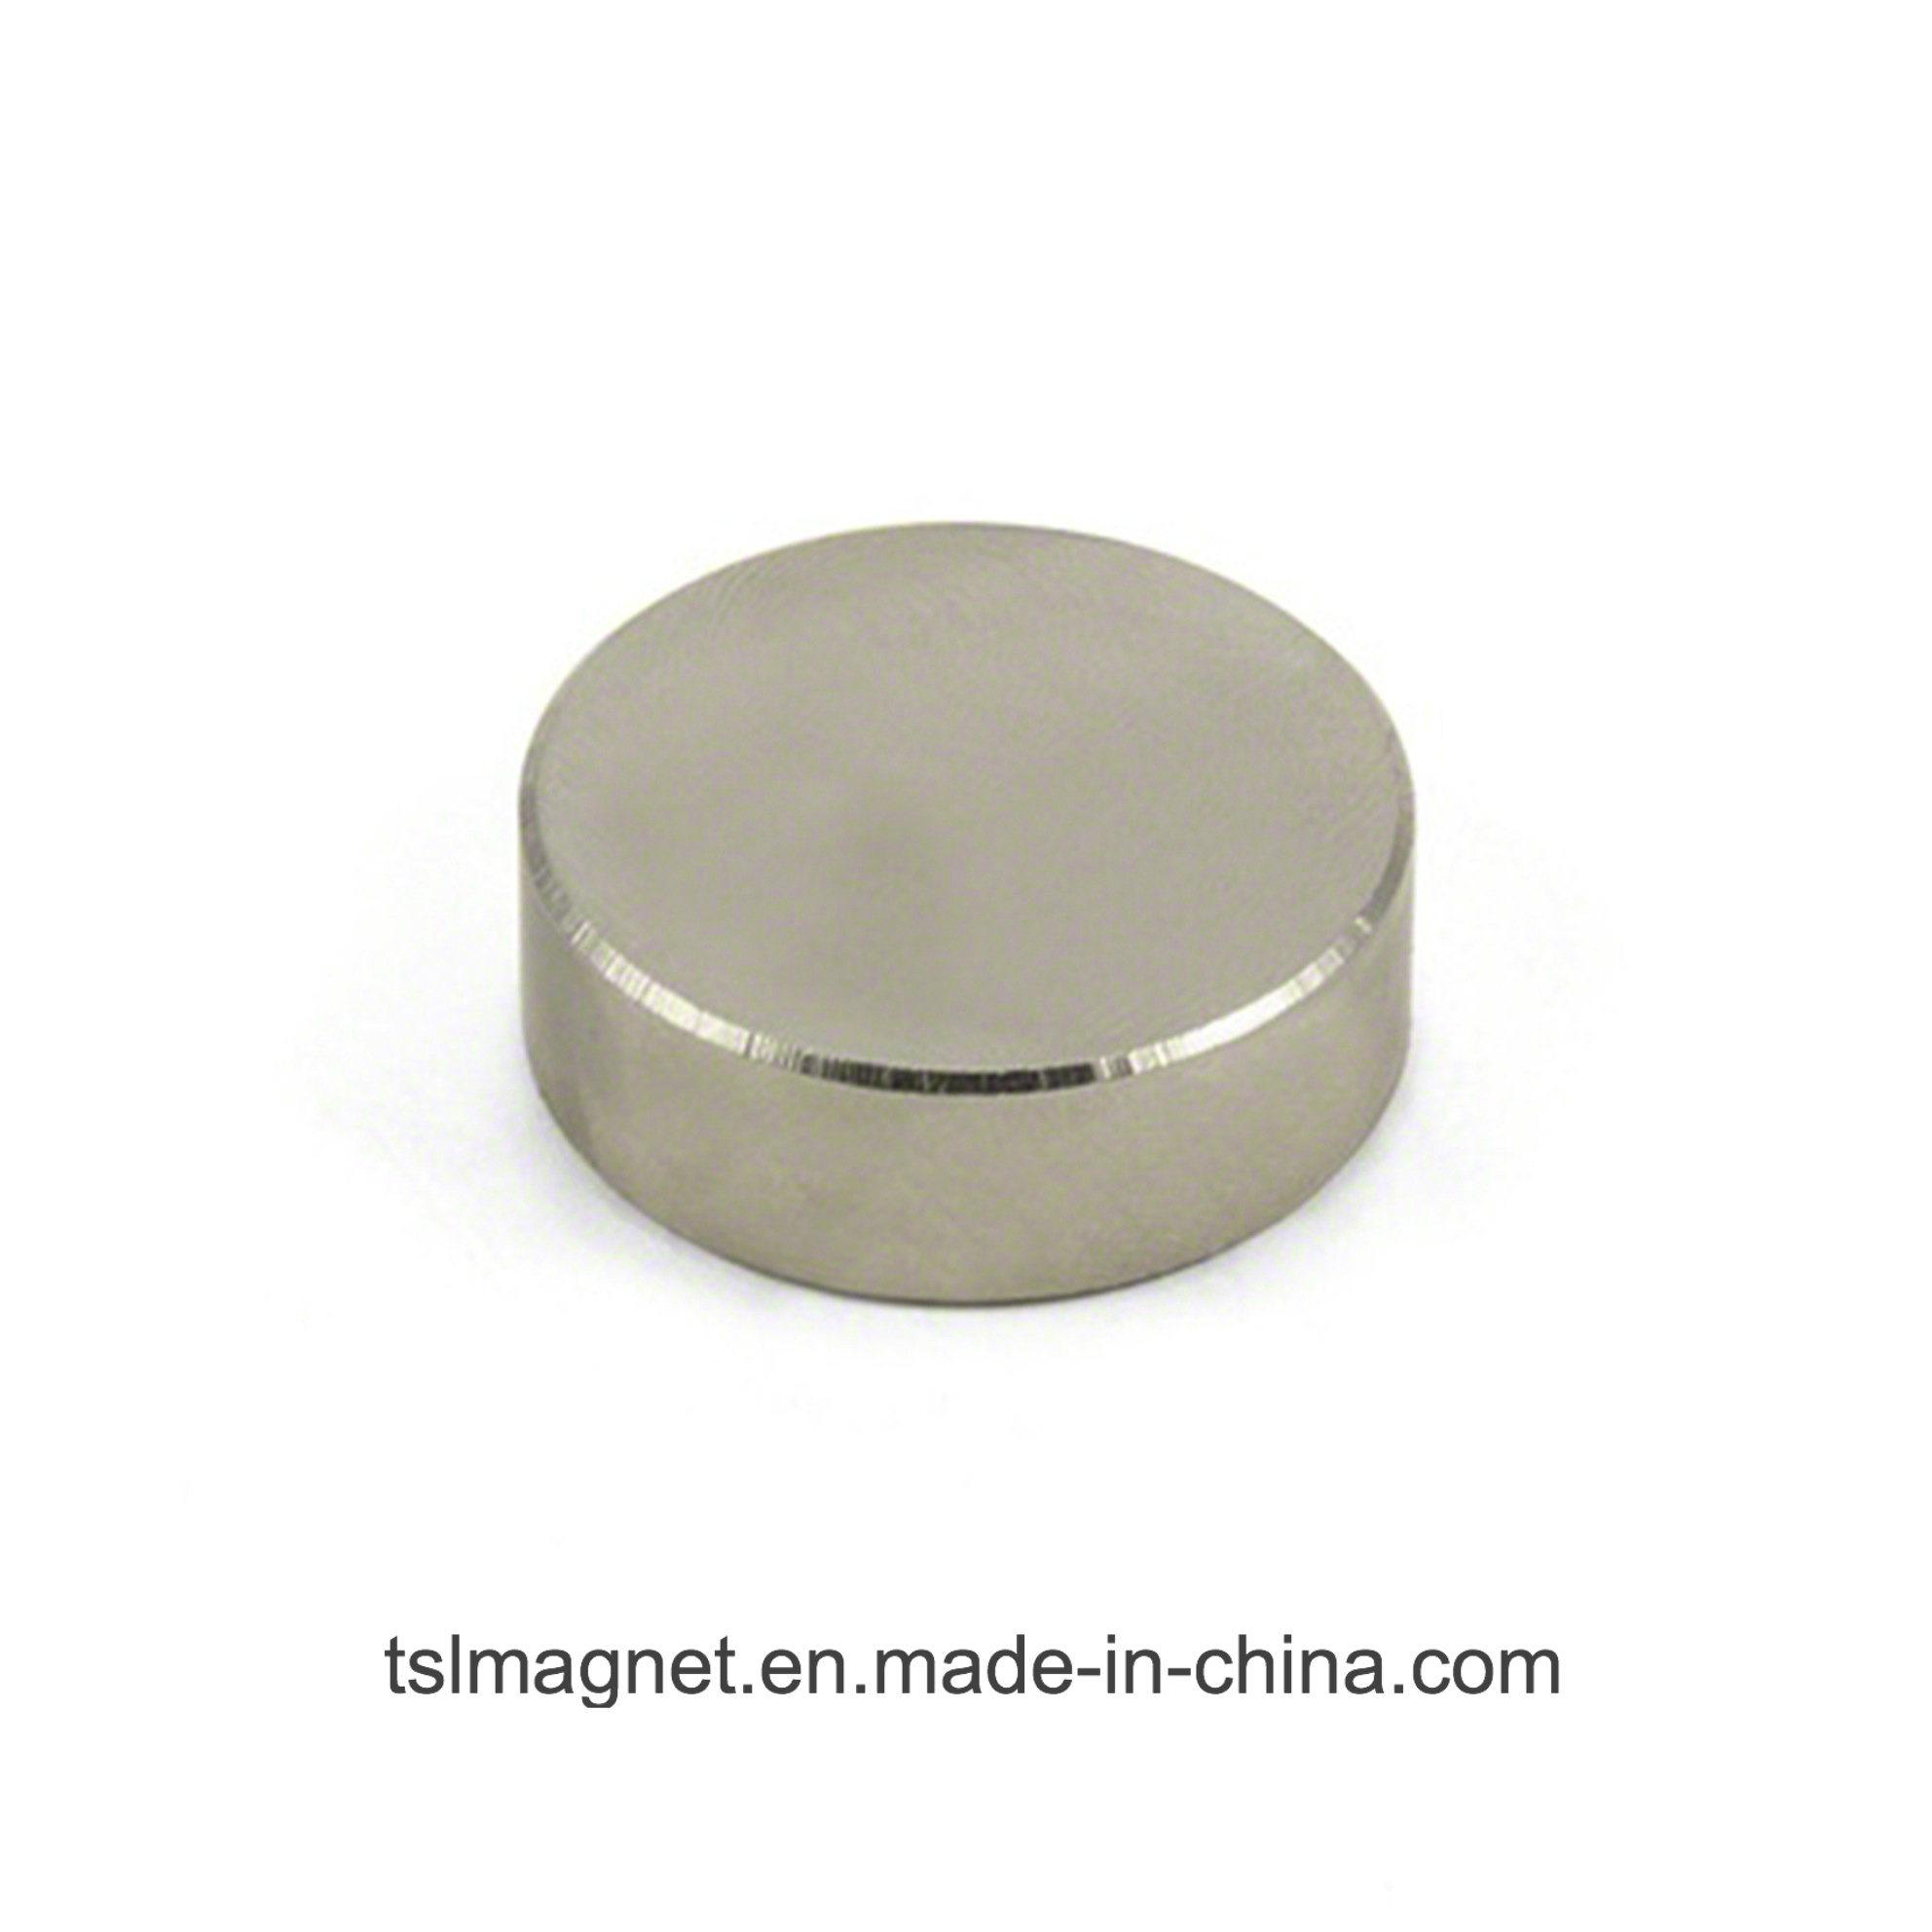 Powerful Permanent Sintered Neodymium Magnet for Bracelet (N35UH)